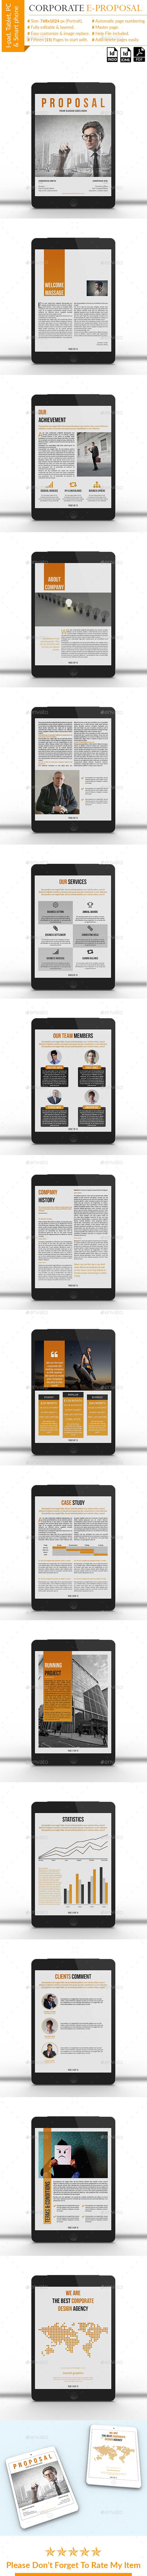 Coporate E-Proposal - Digital Books ePublishing